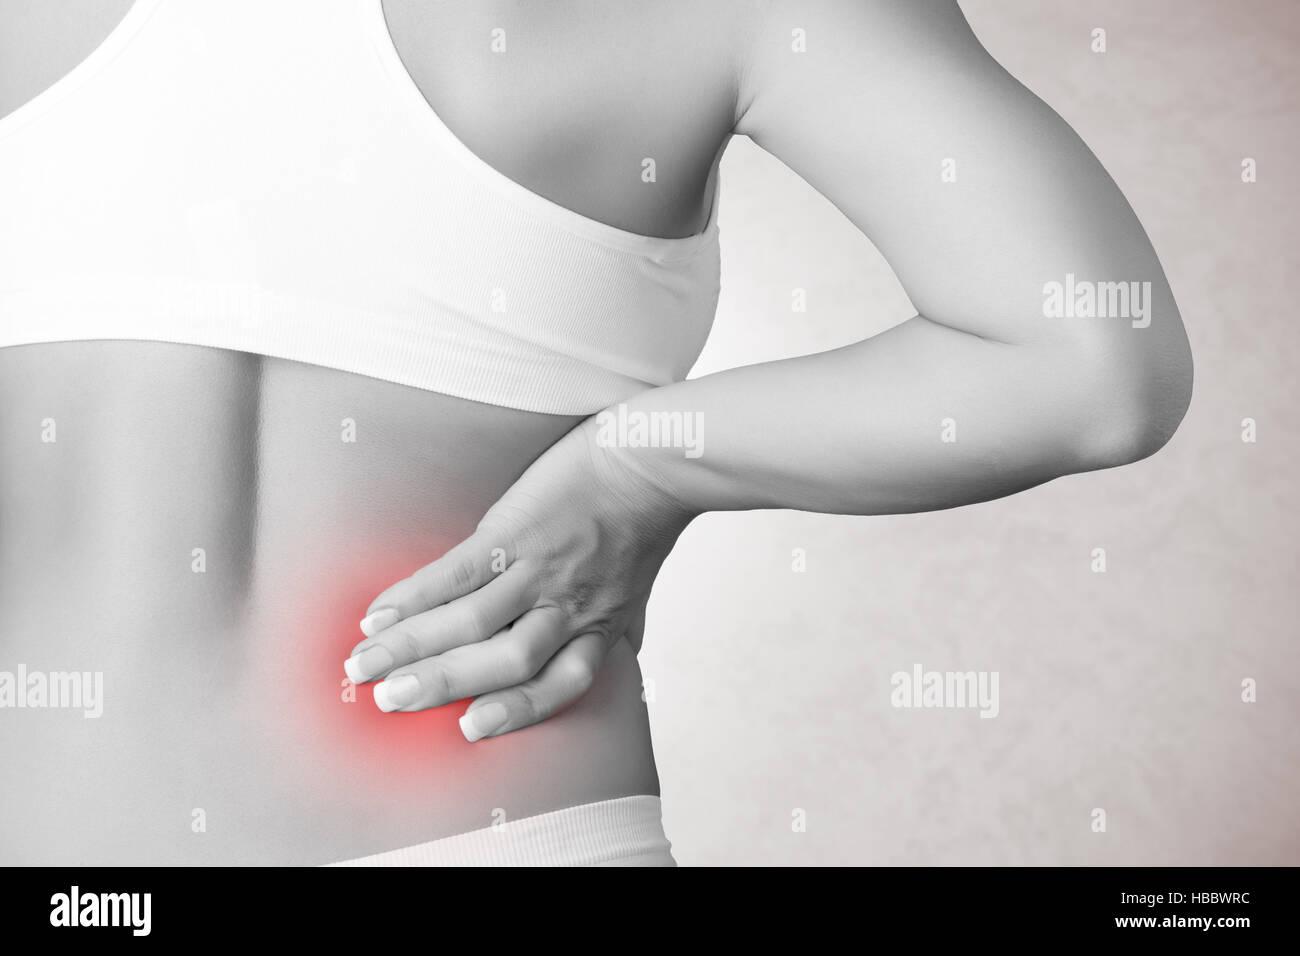 Schmerzen im Rücken Stockbild